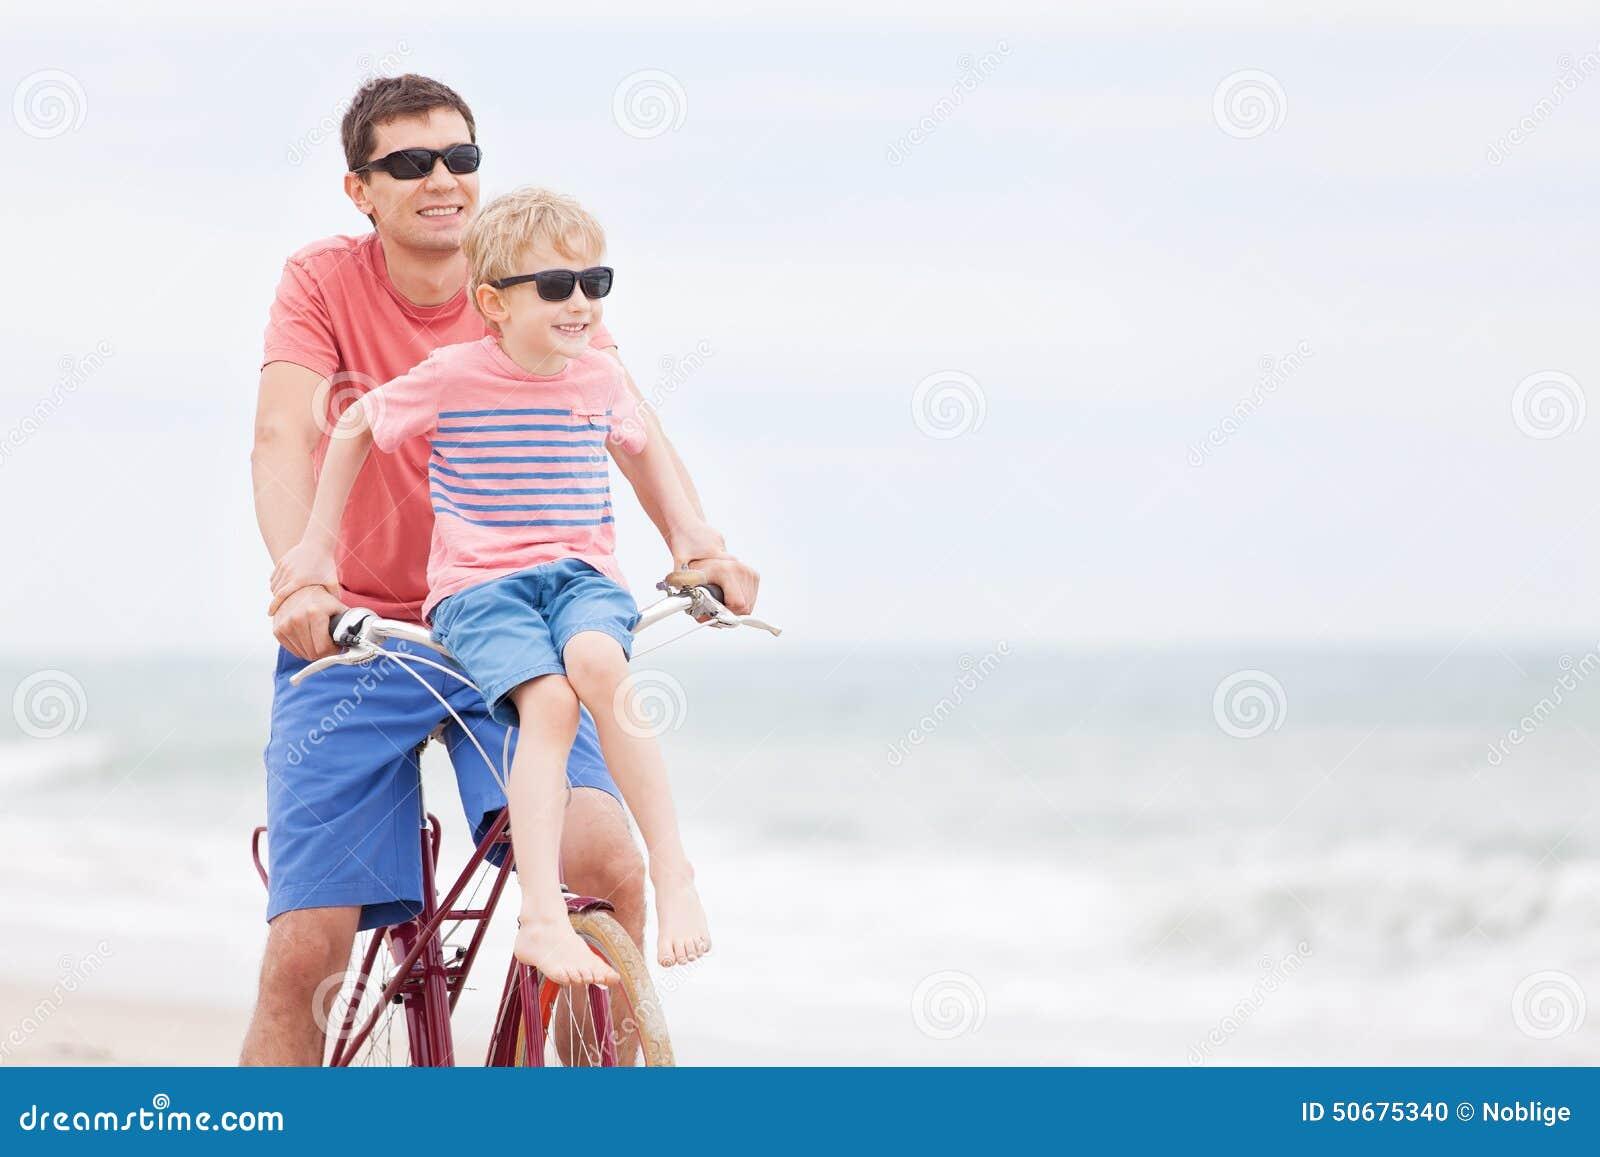 Download 家庭骑自行车 库存照片. 图片 包括有 蓝色, 室外, 乘驾, 孩子, 父亲, 爸爸, 男朋友, 健康, 自行车骑士 - 50675340